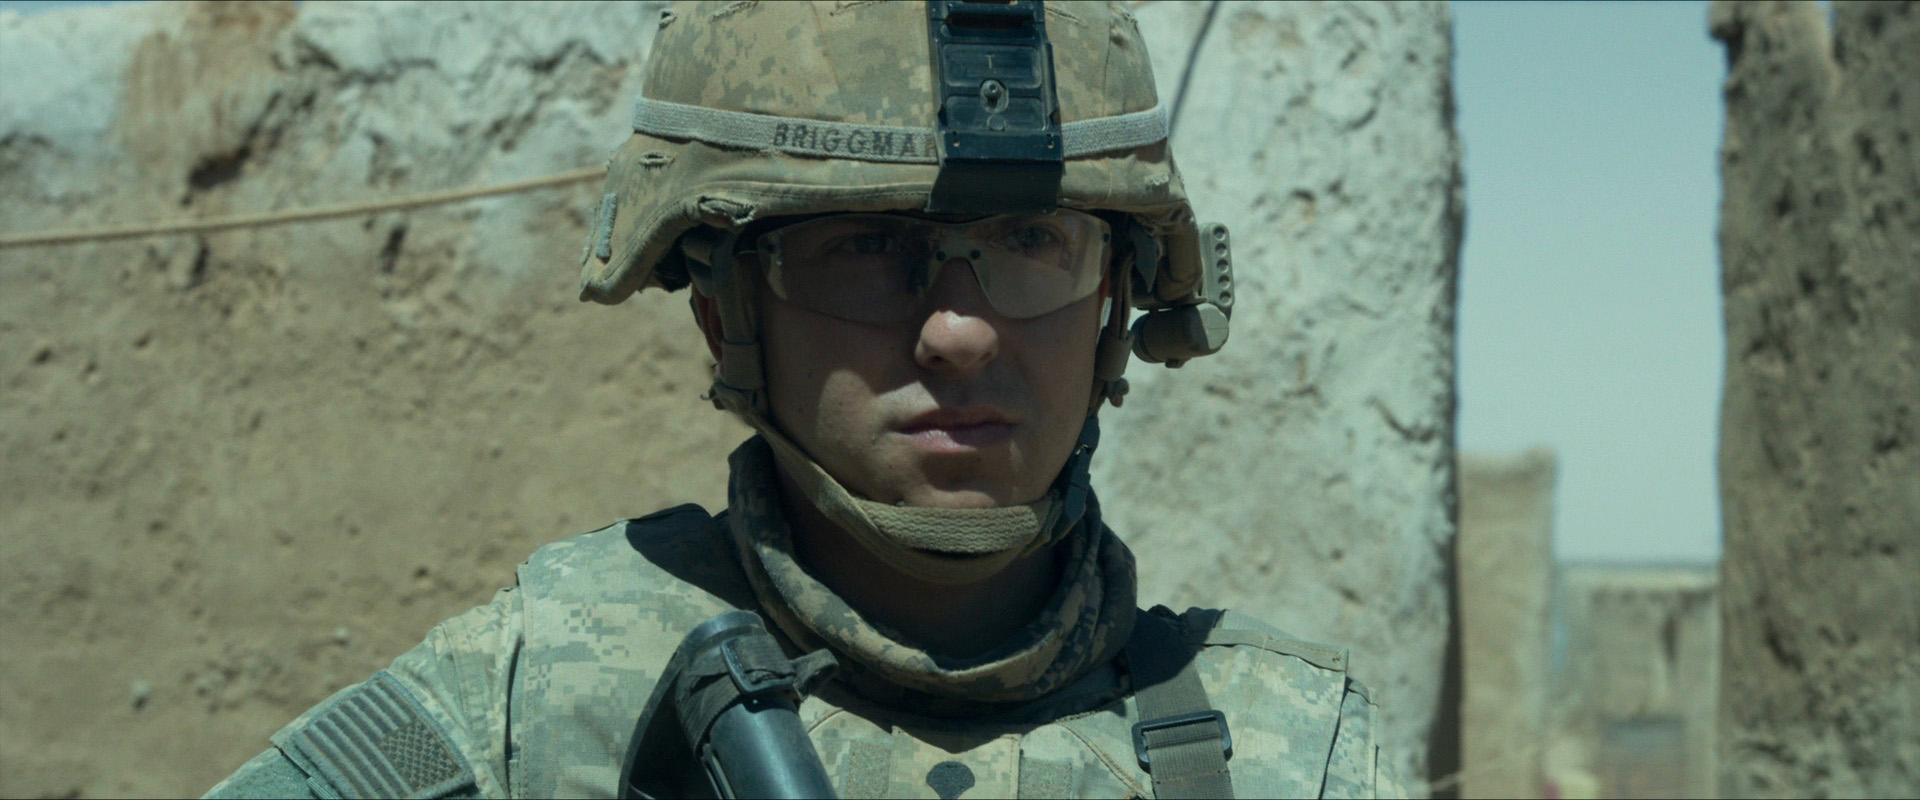 Ölüm Takımı | The Kill Team | 2019 | BDRip | XviD | Türkçe Dublaj | m720p - m1080p | BluRay | Dual | TR-EN | Tek Link